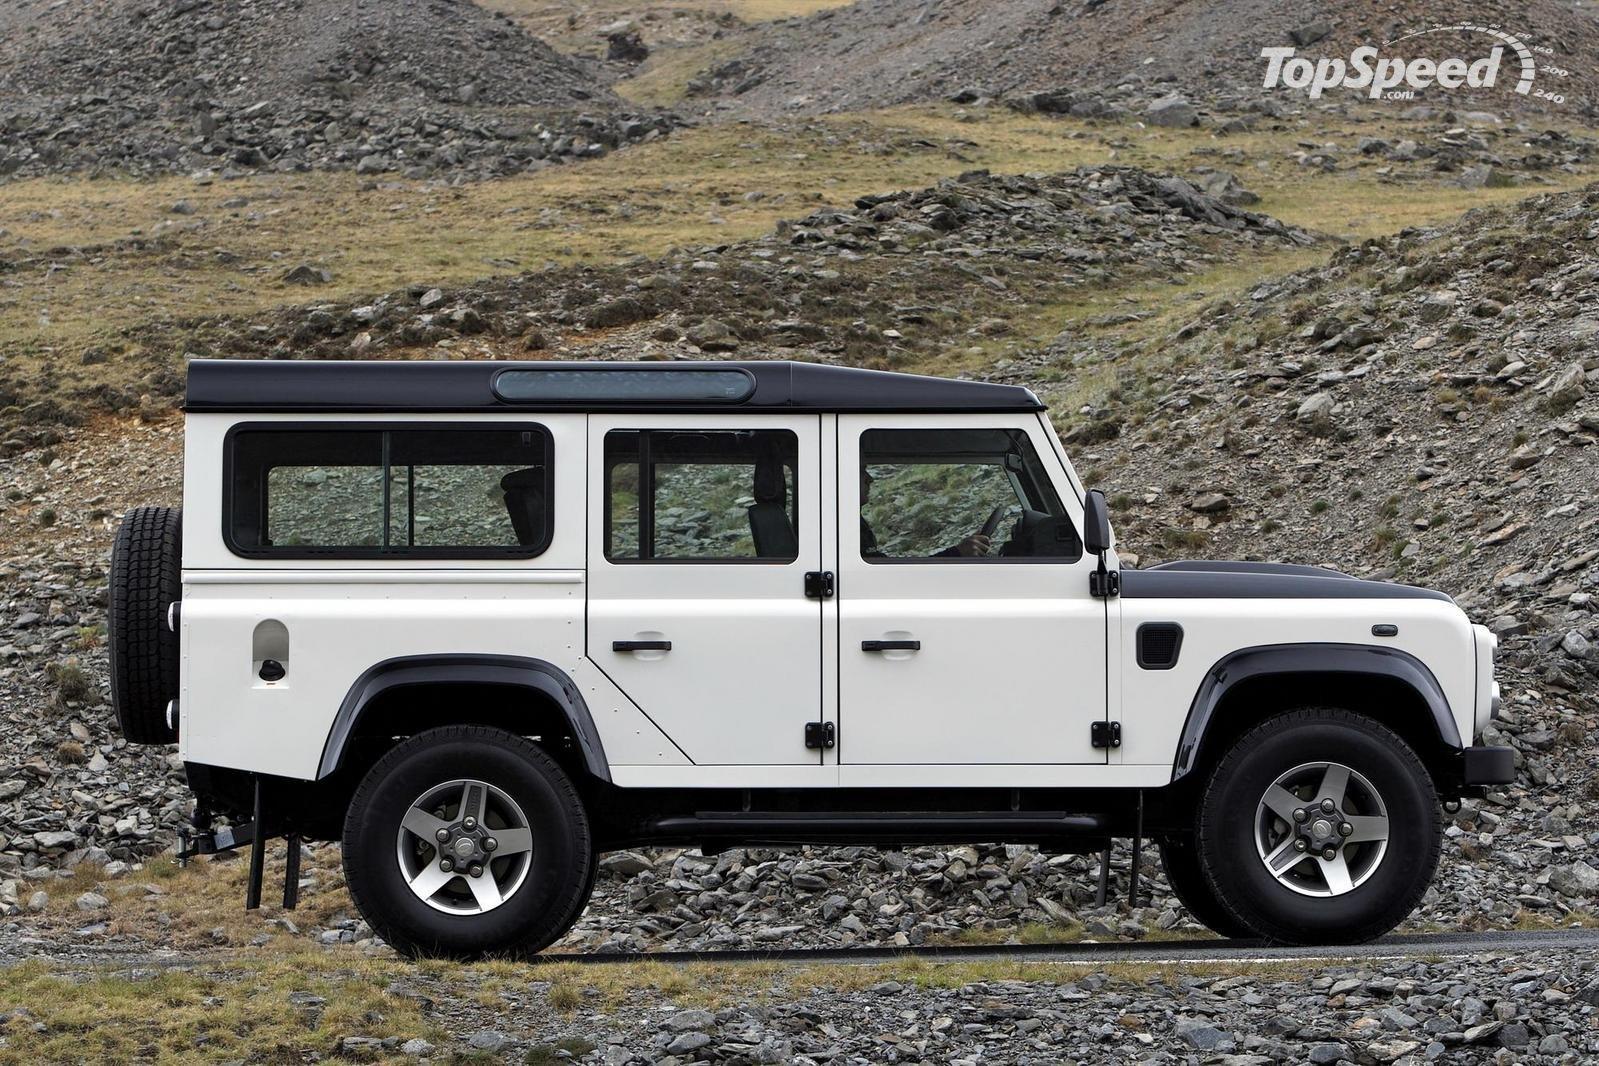 New 2018 Land Rover Defender >> Land-Rover Defender history, photos on Better Parts LTD